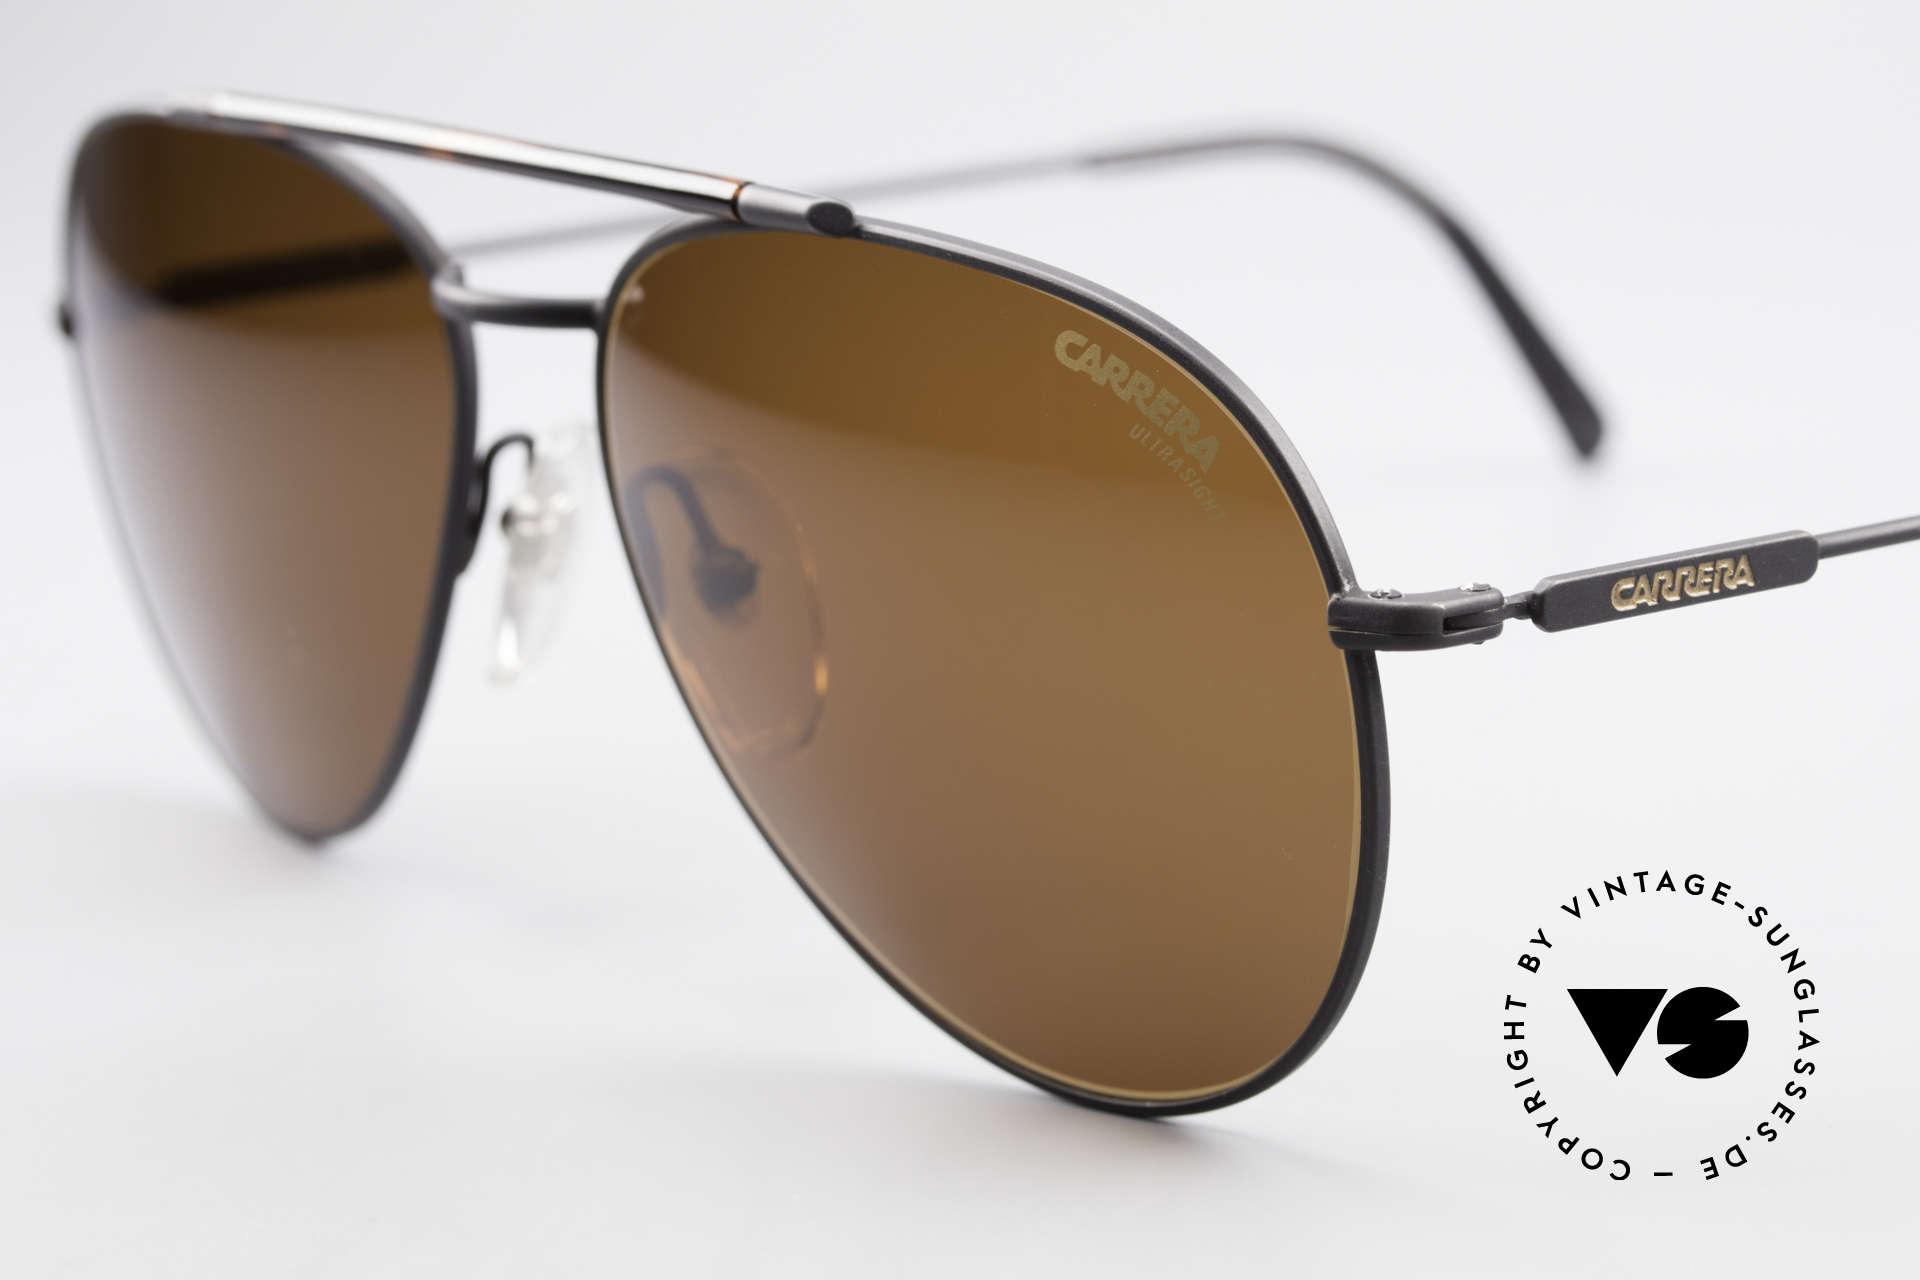 Carrera 5349 True Vintage Aviator Shades, Carrera UTRASIGHT lenses for 100% UV protection, Made for Men